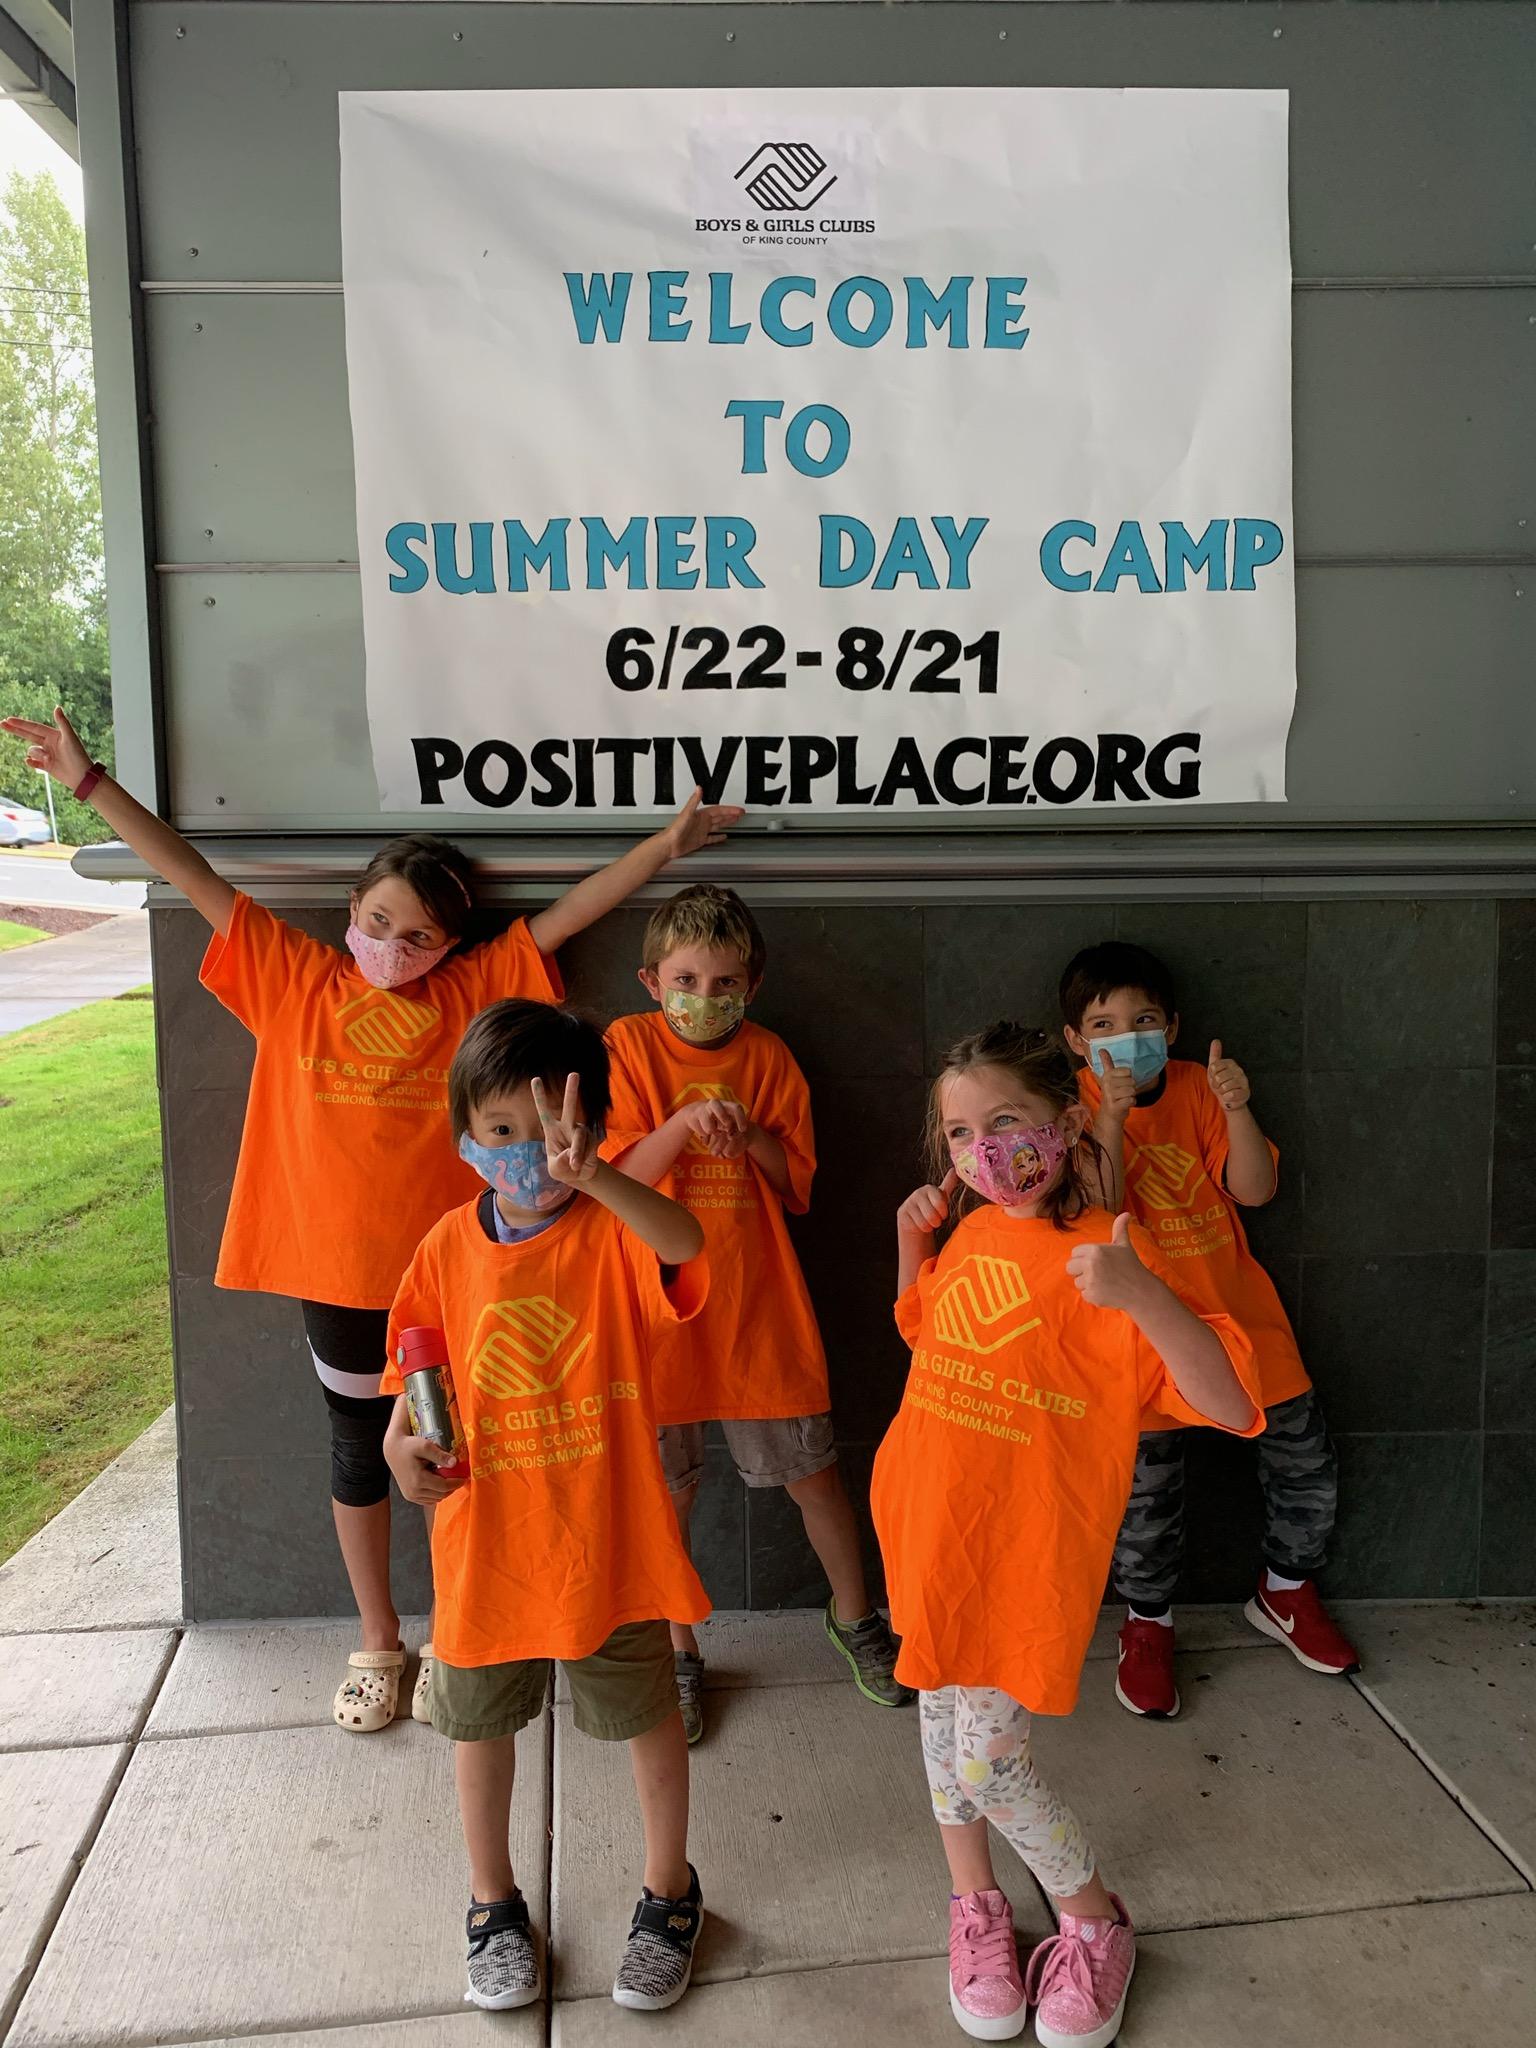 Samm Camp Picture